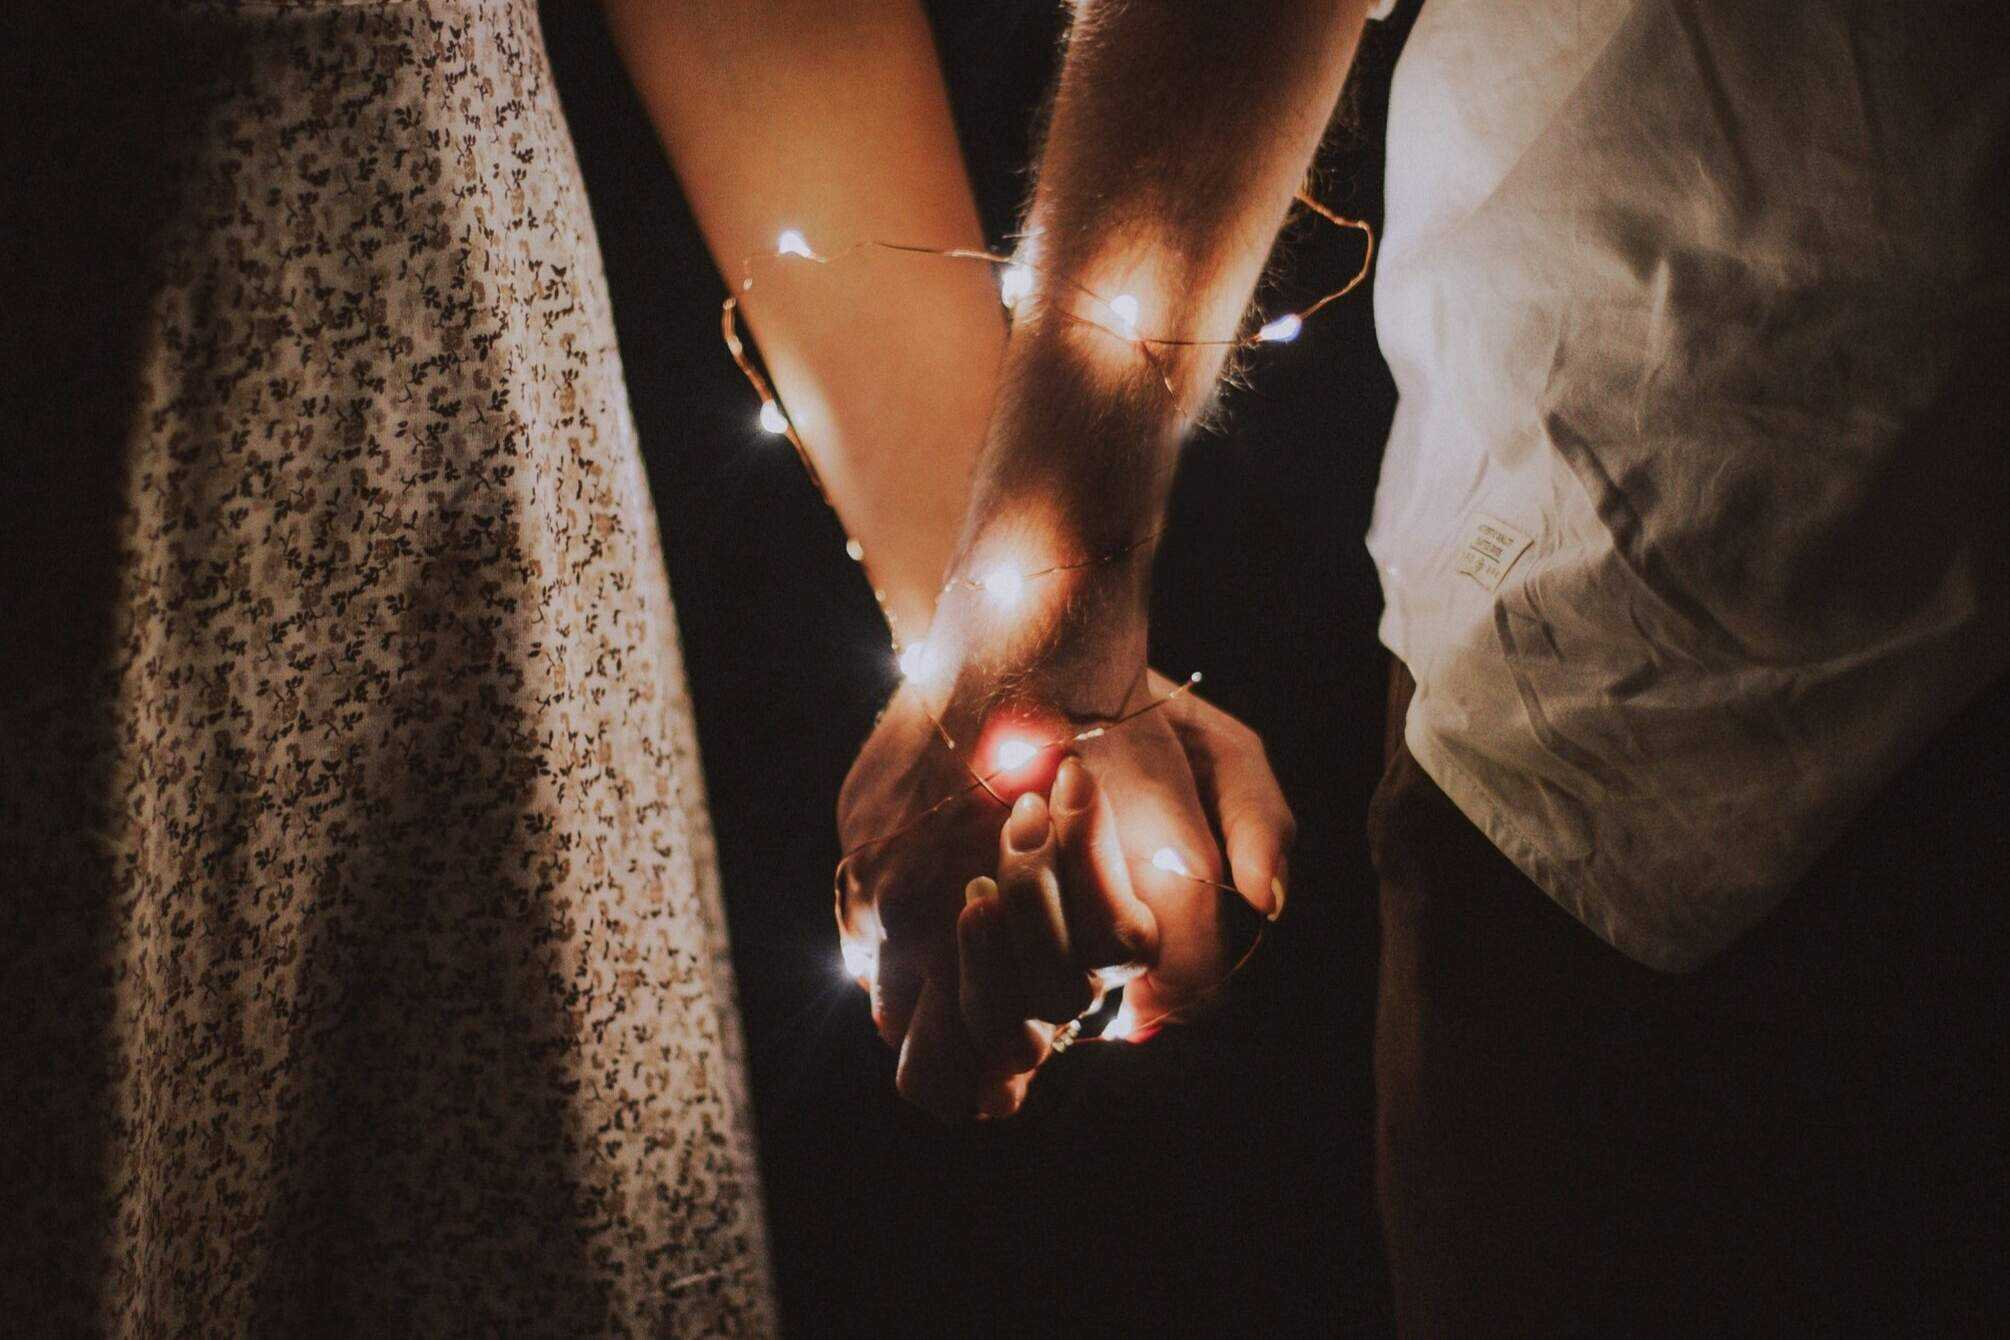 Sex in langjährigen Beziehungen